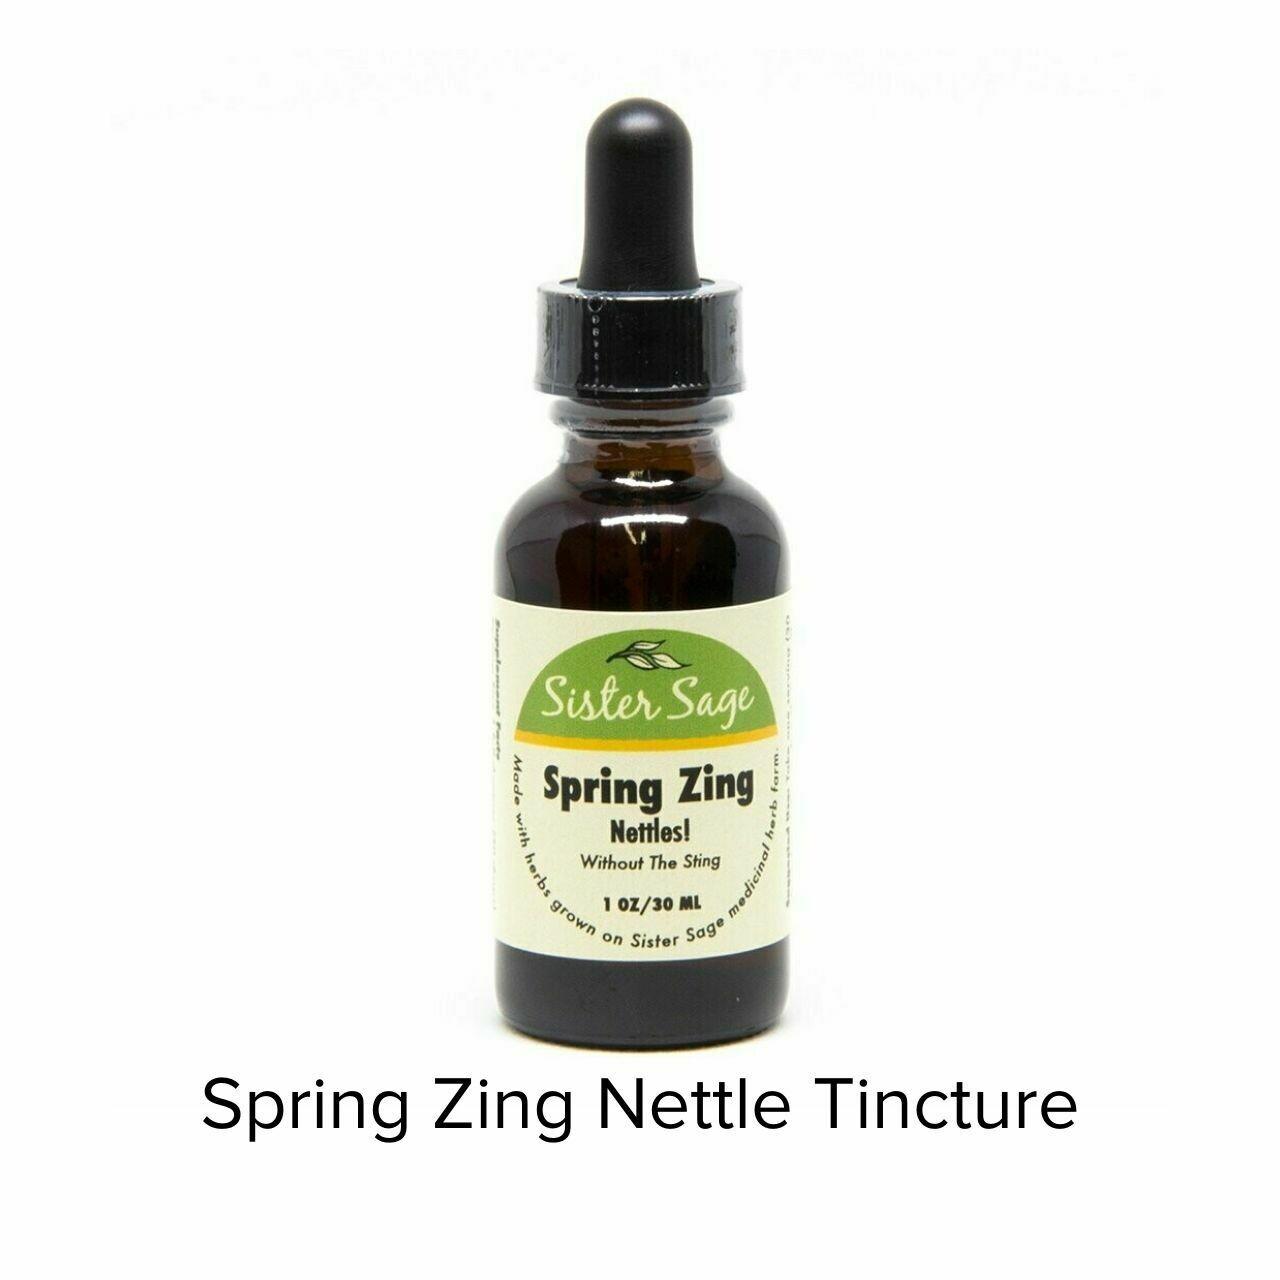 Sister Sage Spring Zing Tincture